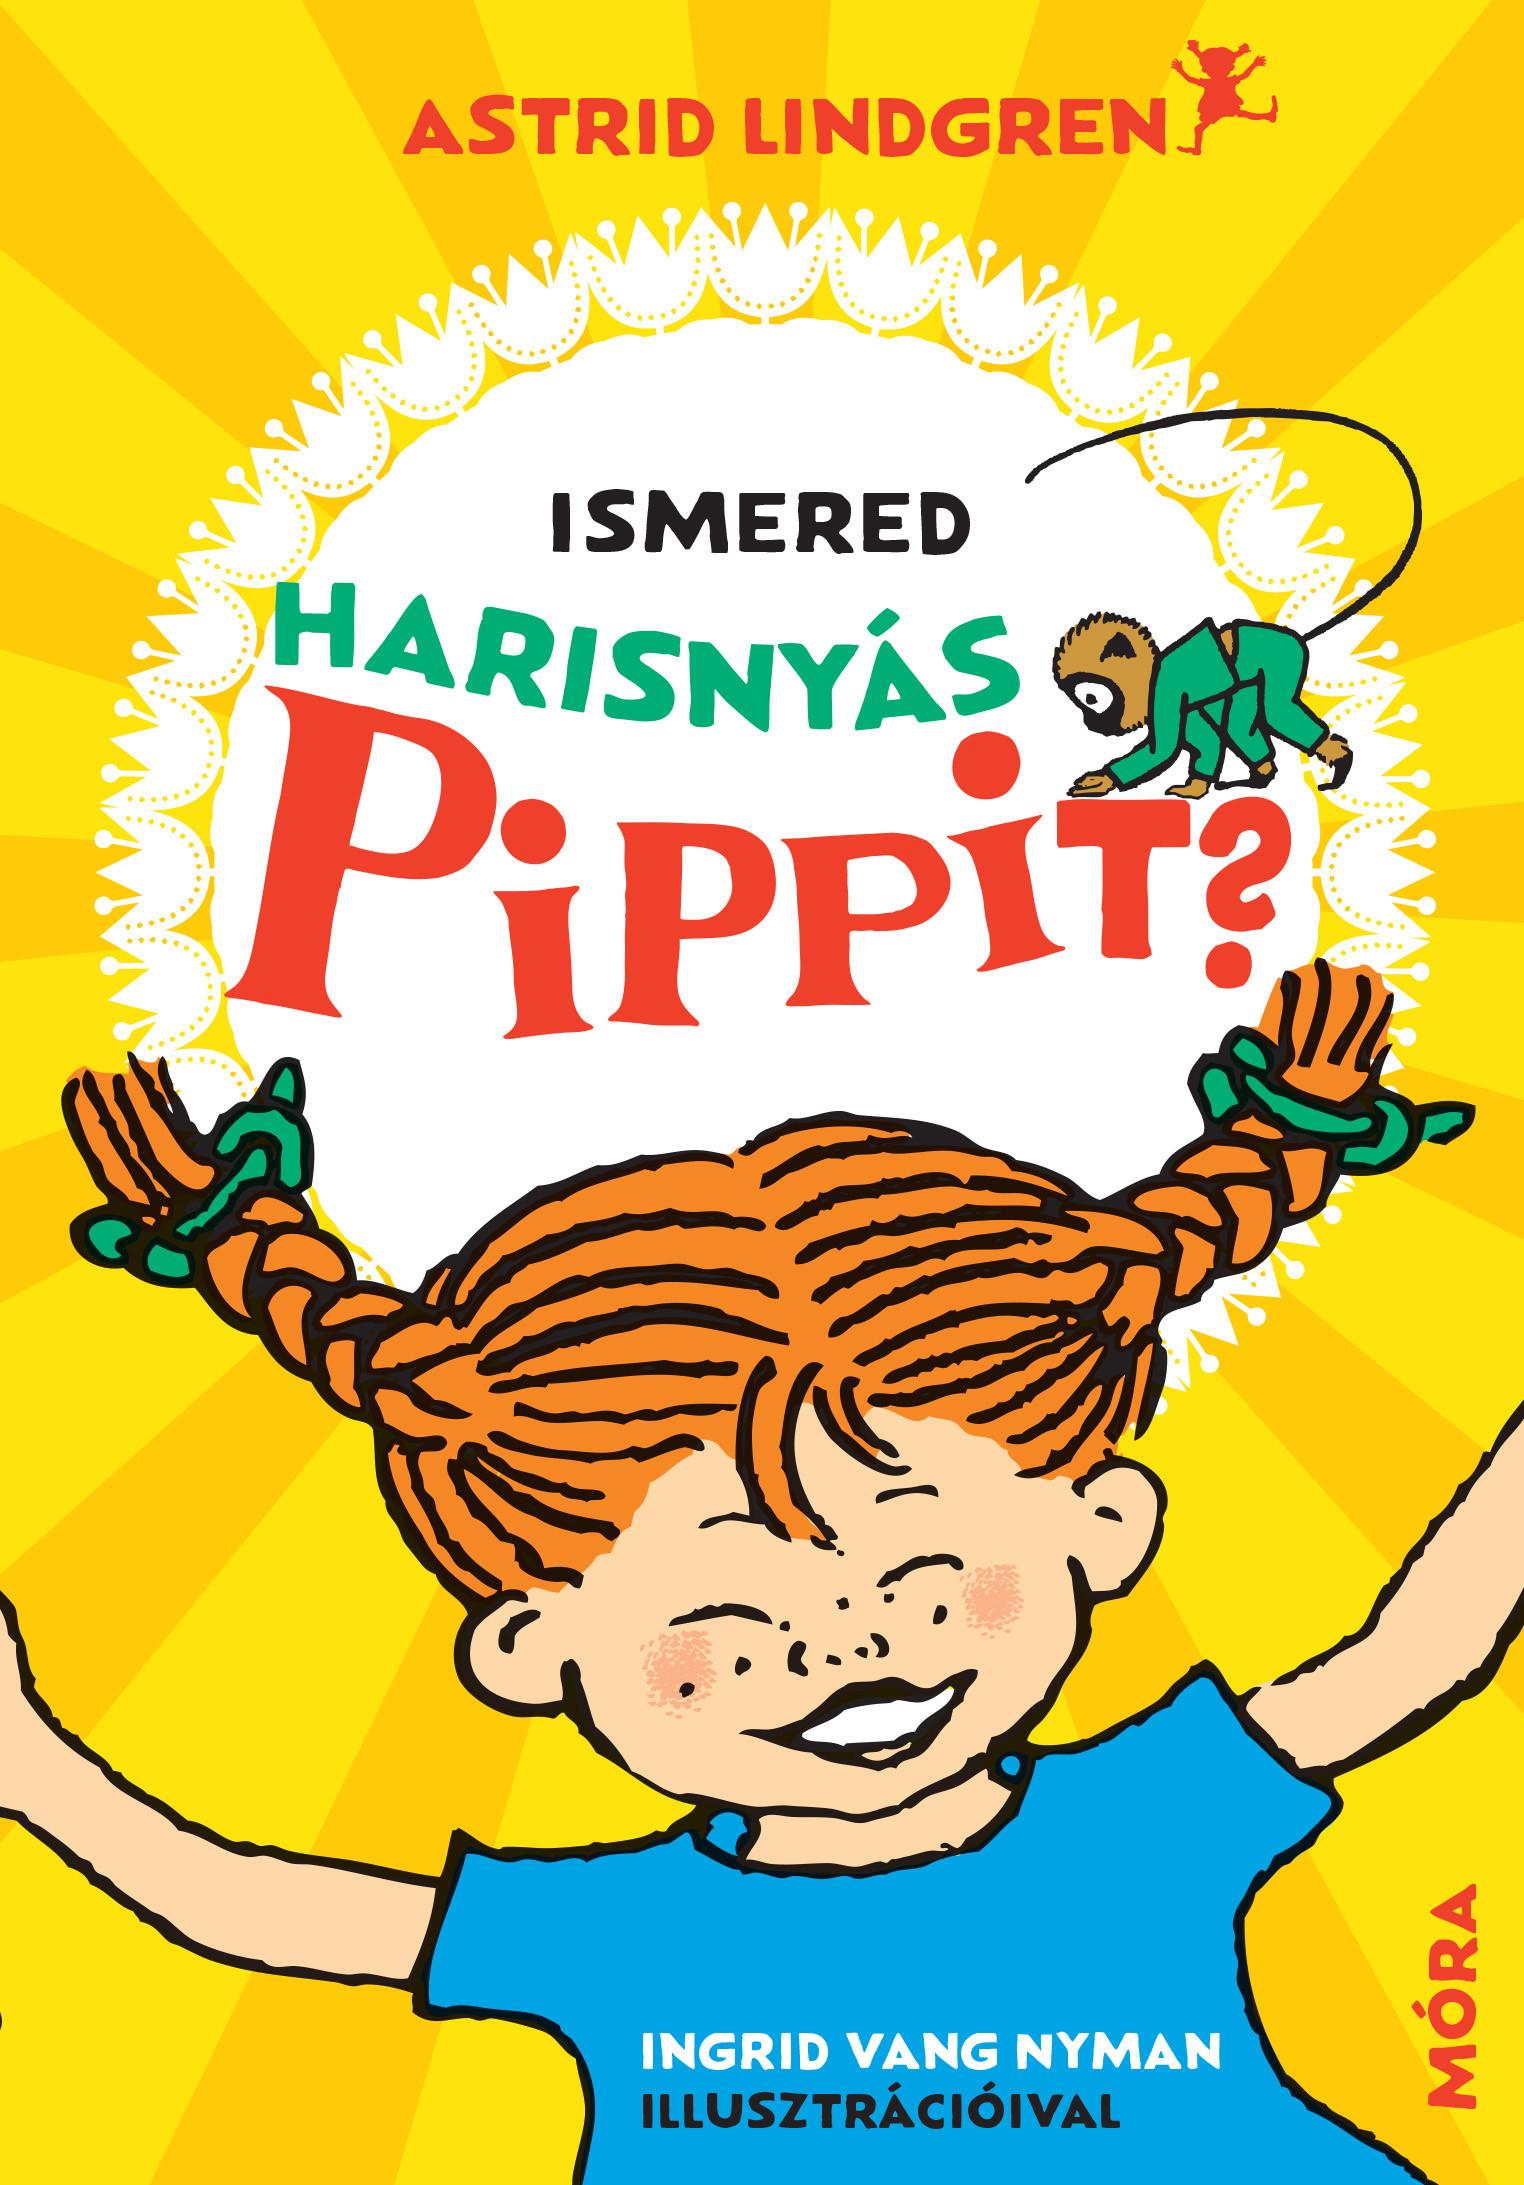 Ismered Harisnyás Pippit? - Astrid Lindgren |